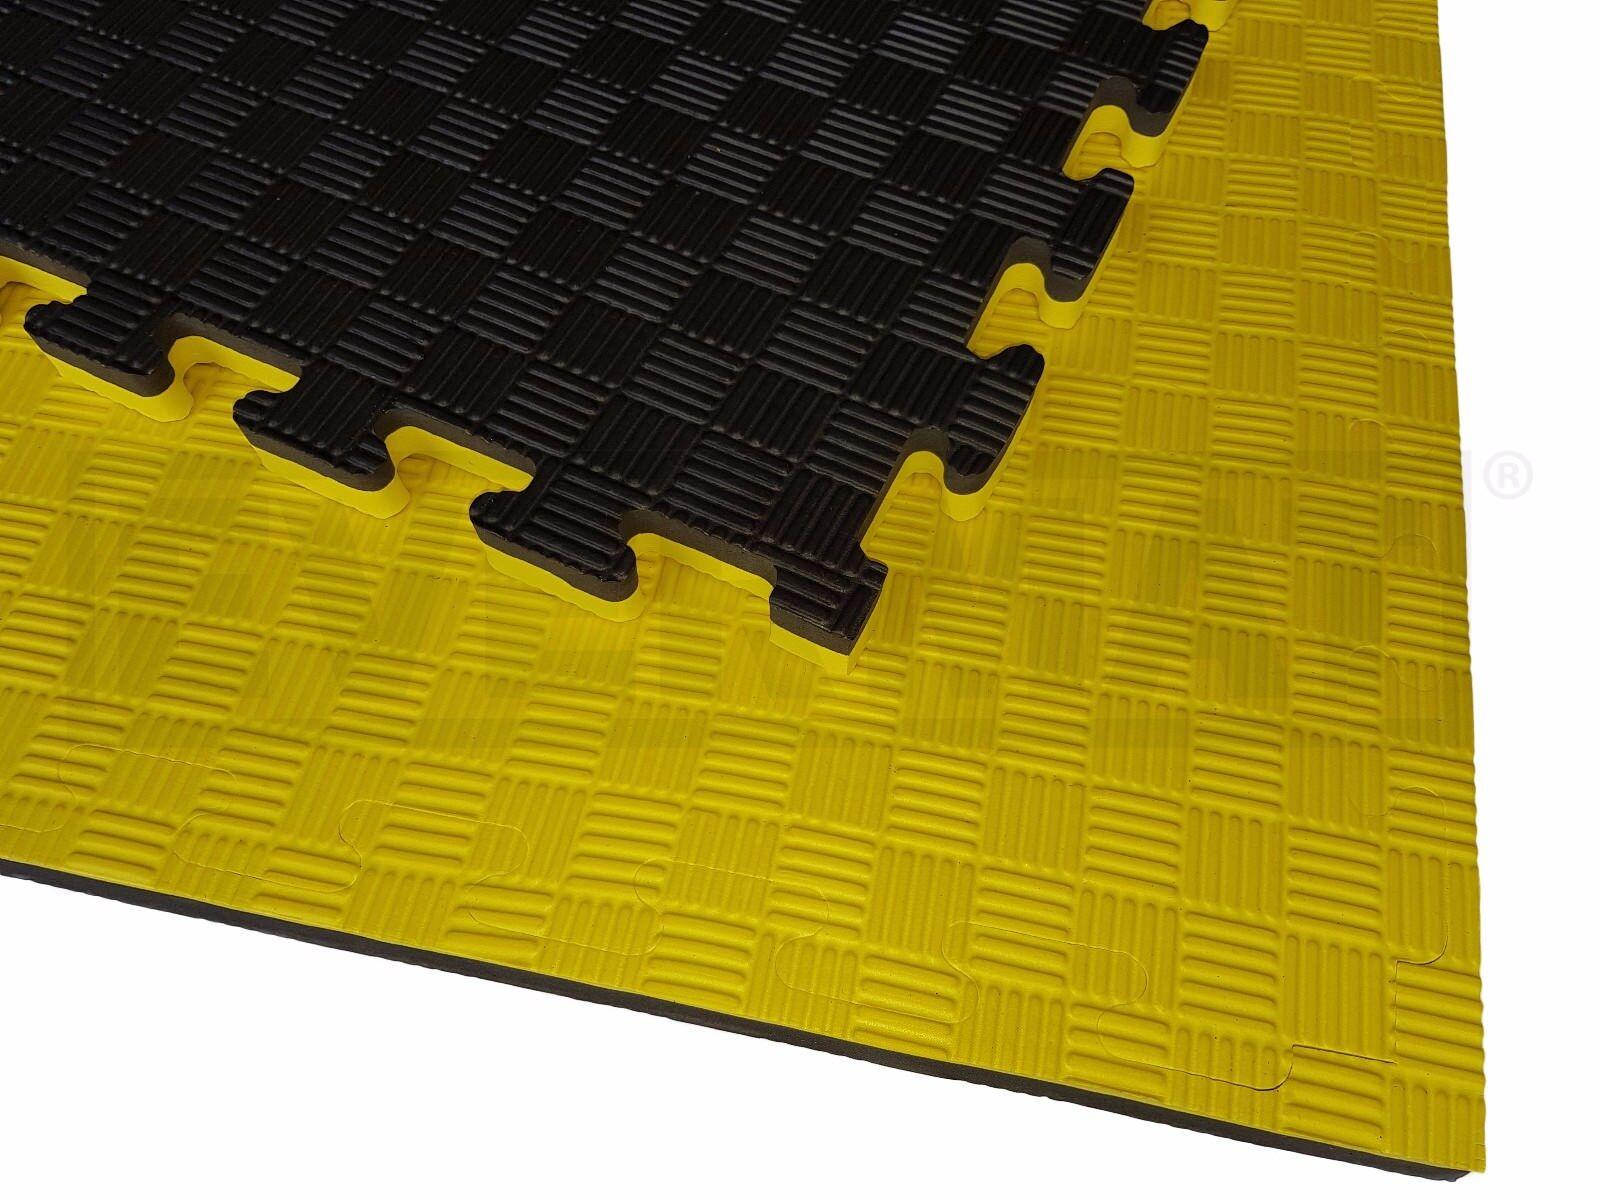 EVERMAT® 6sqm 20mm Reversible Jiu Jitsu Judo Karate MMA Taekwondo Gym Floor Mat